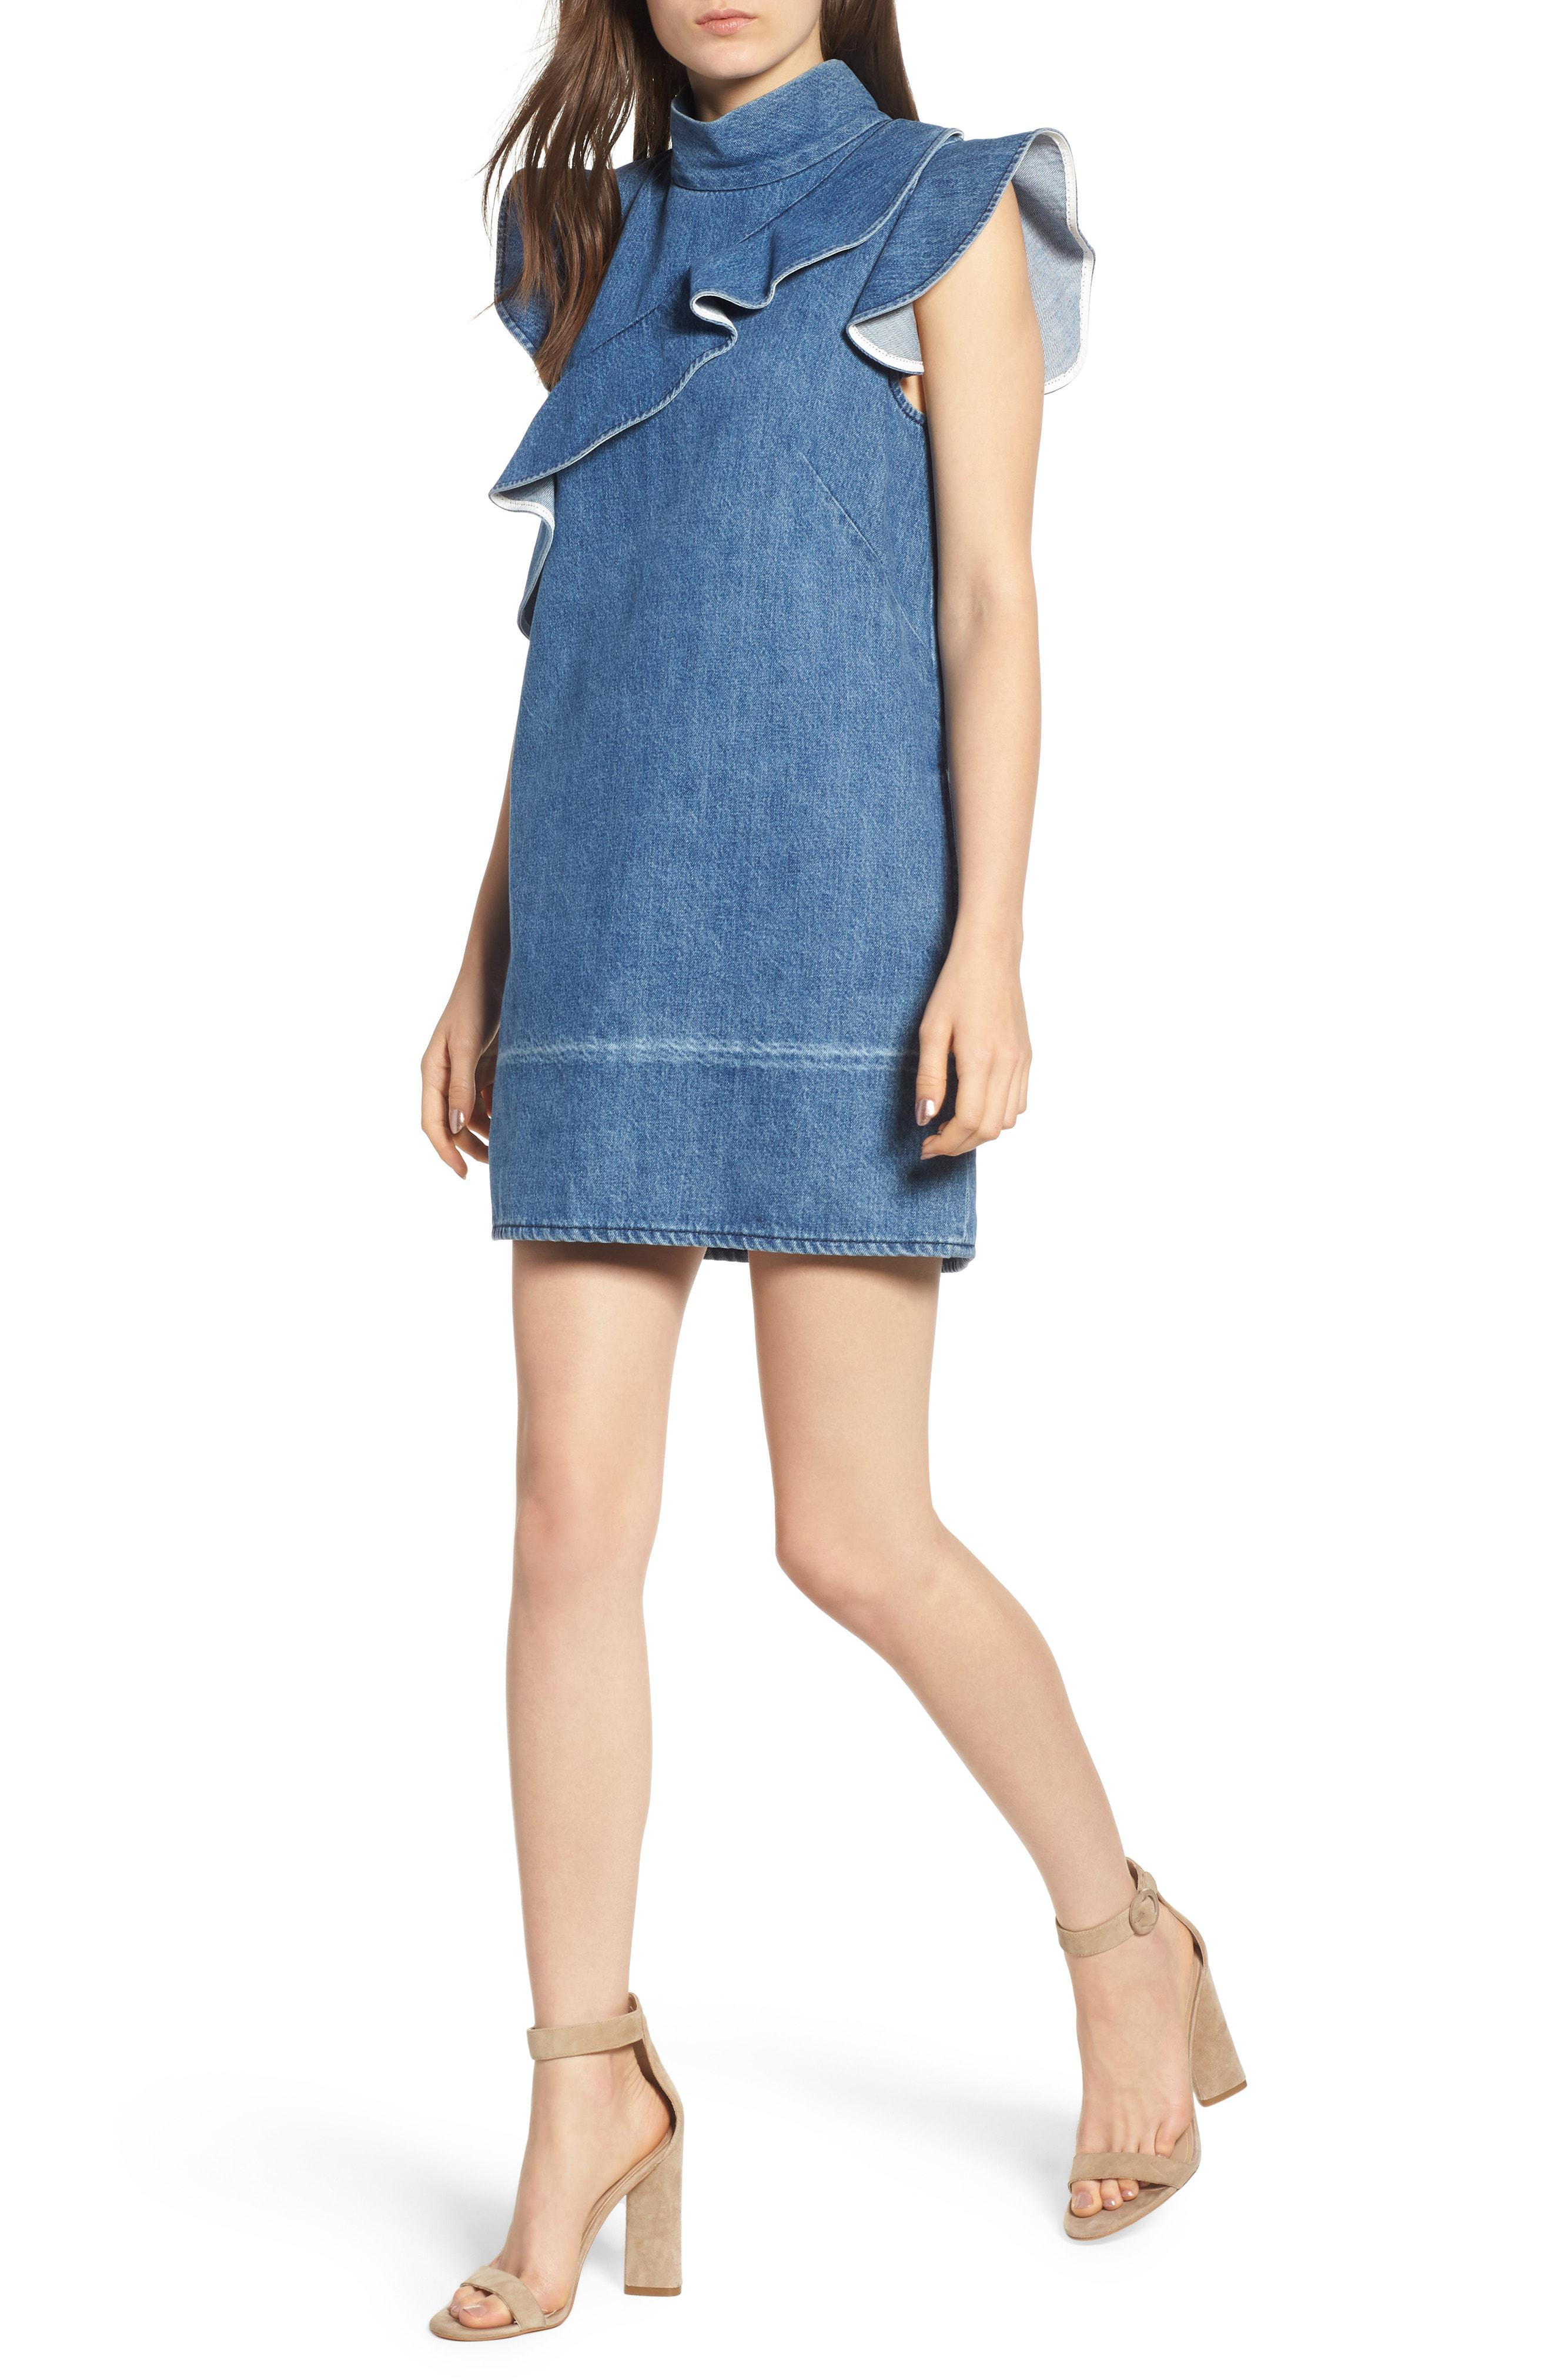 884fc736364 Lyst - Mcguire Sorbonne Denim Shift Dress in Blue